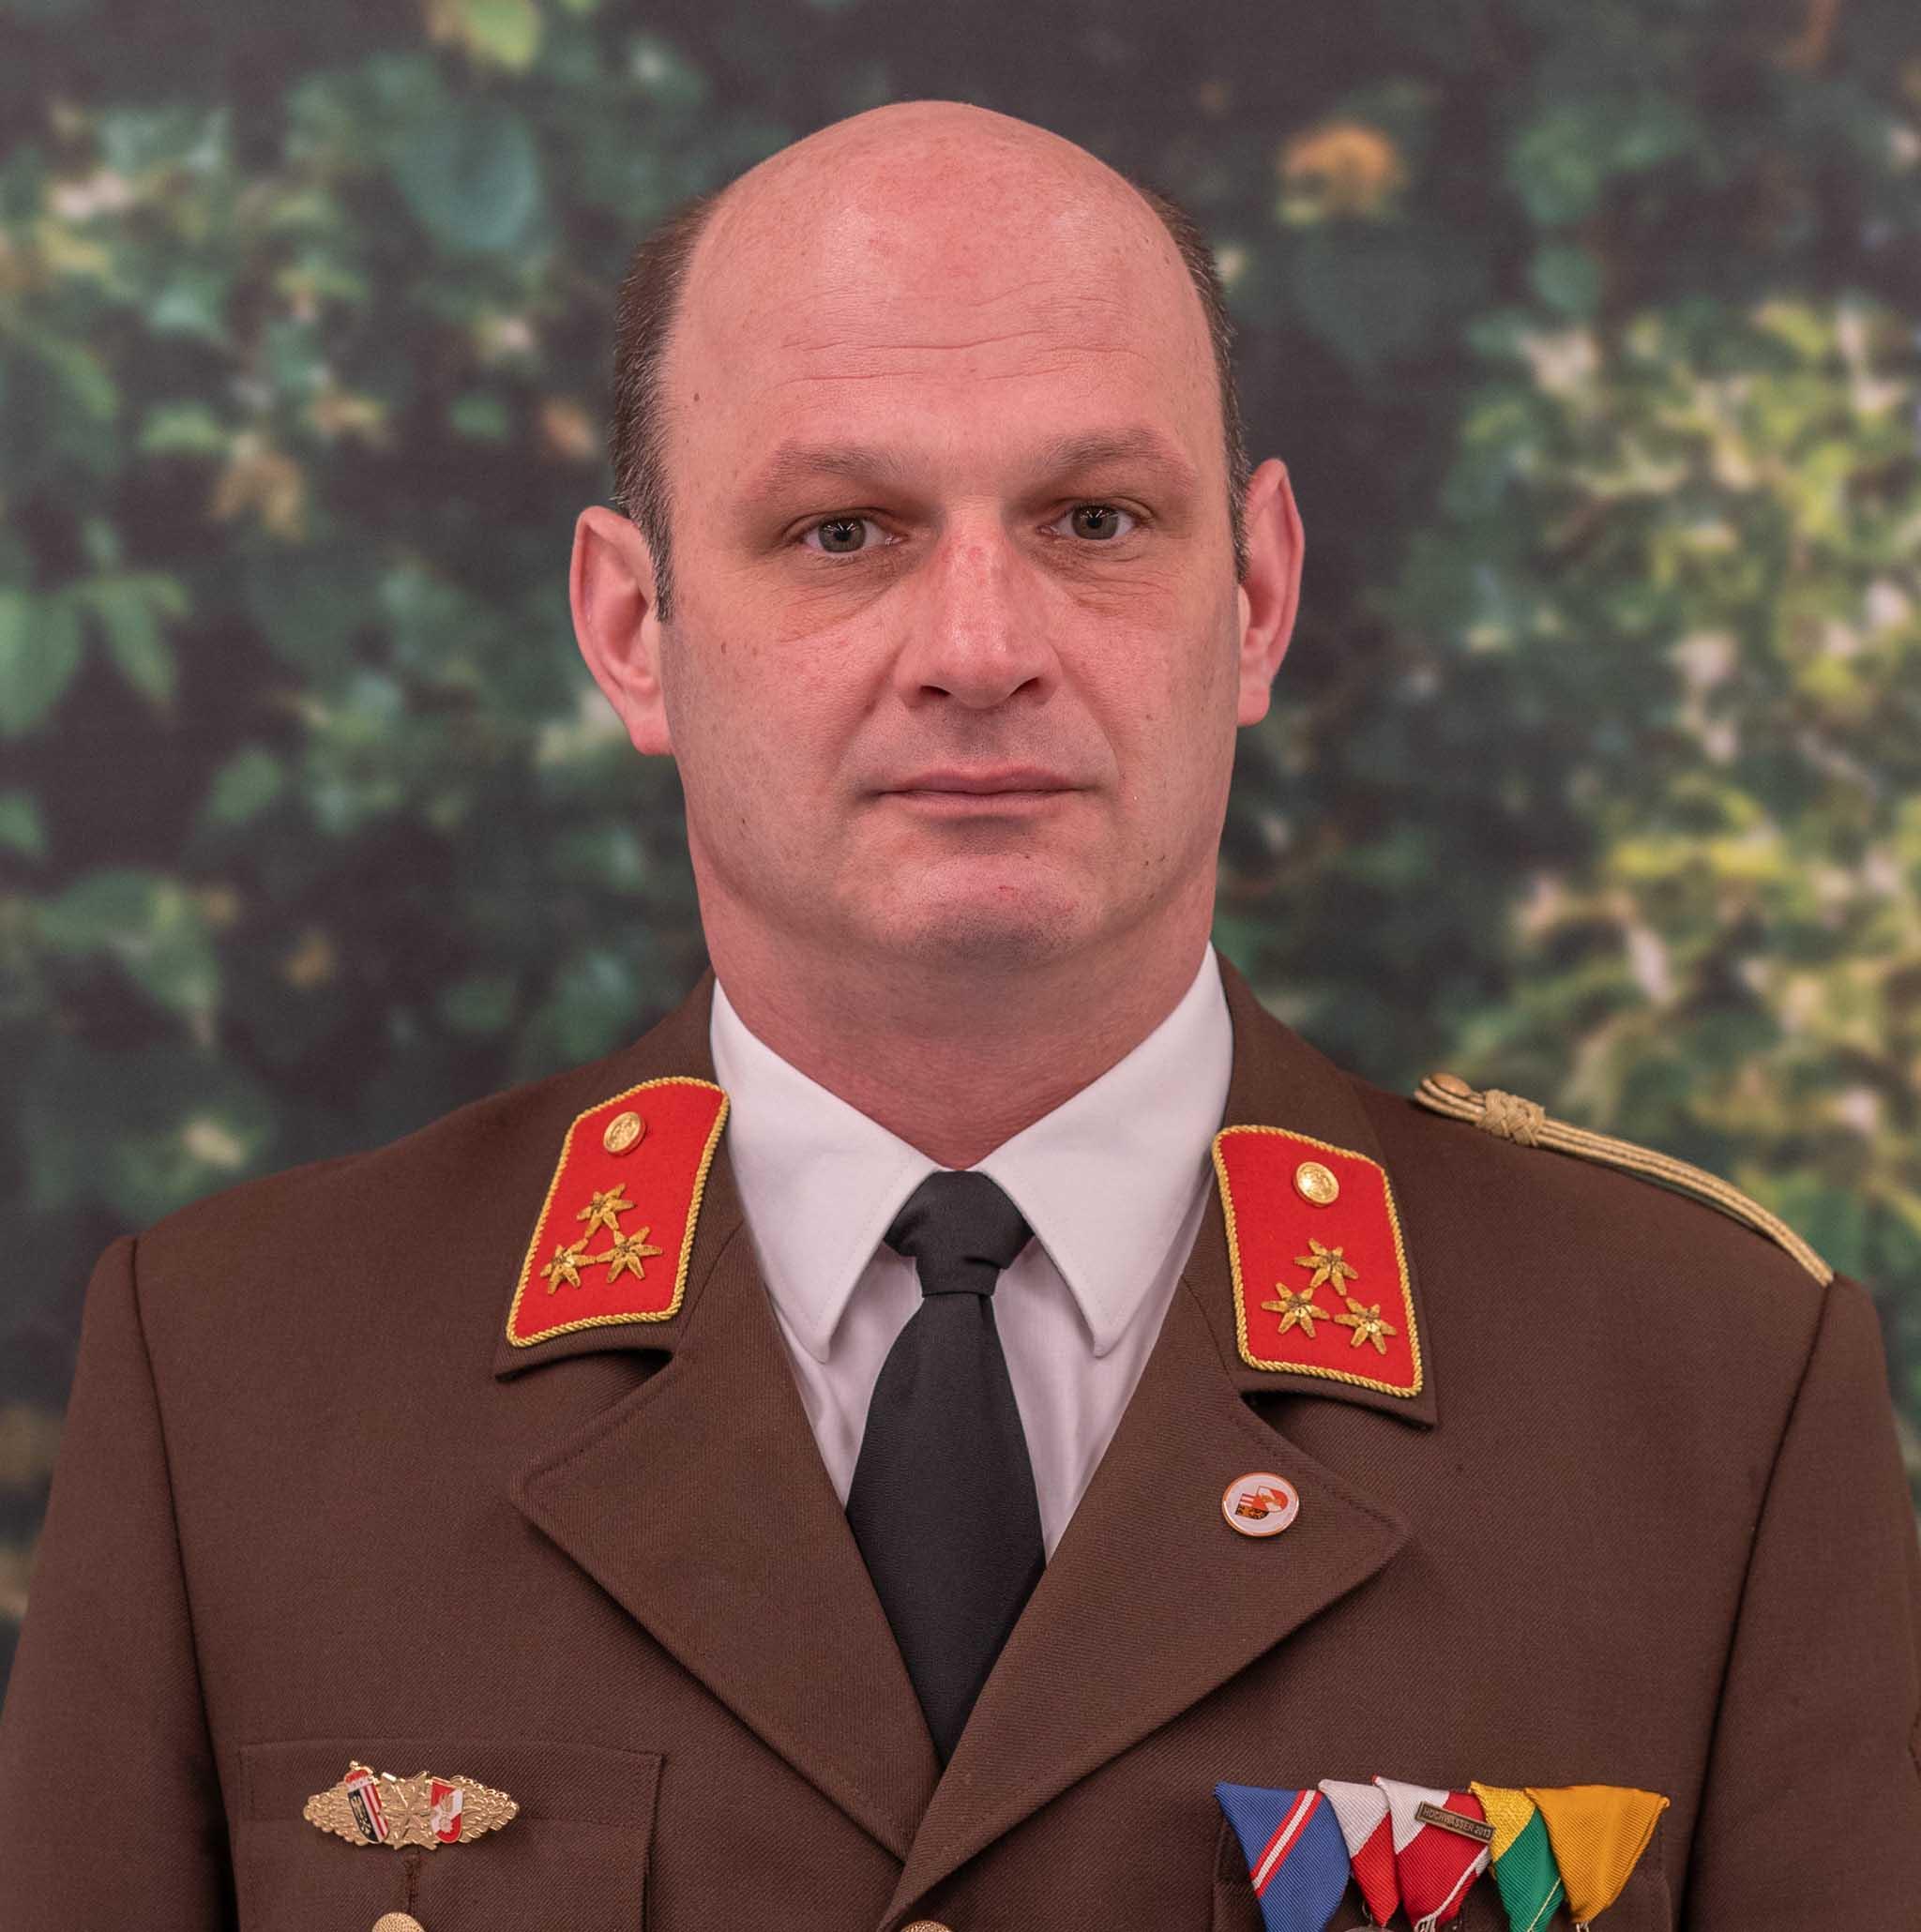 HBI Manfred Kerschbaumer